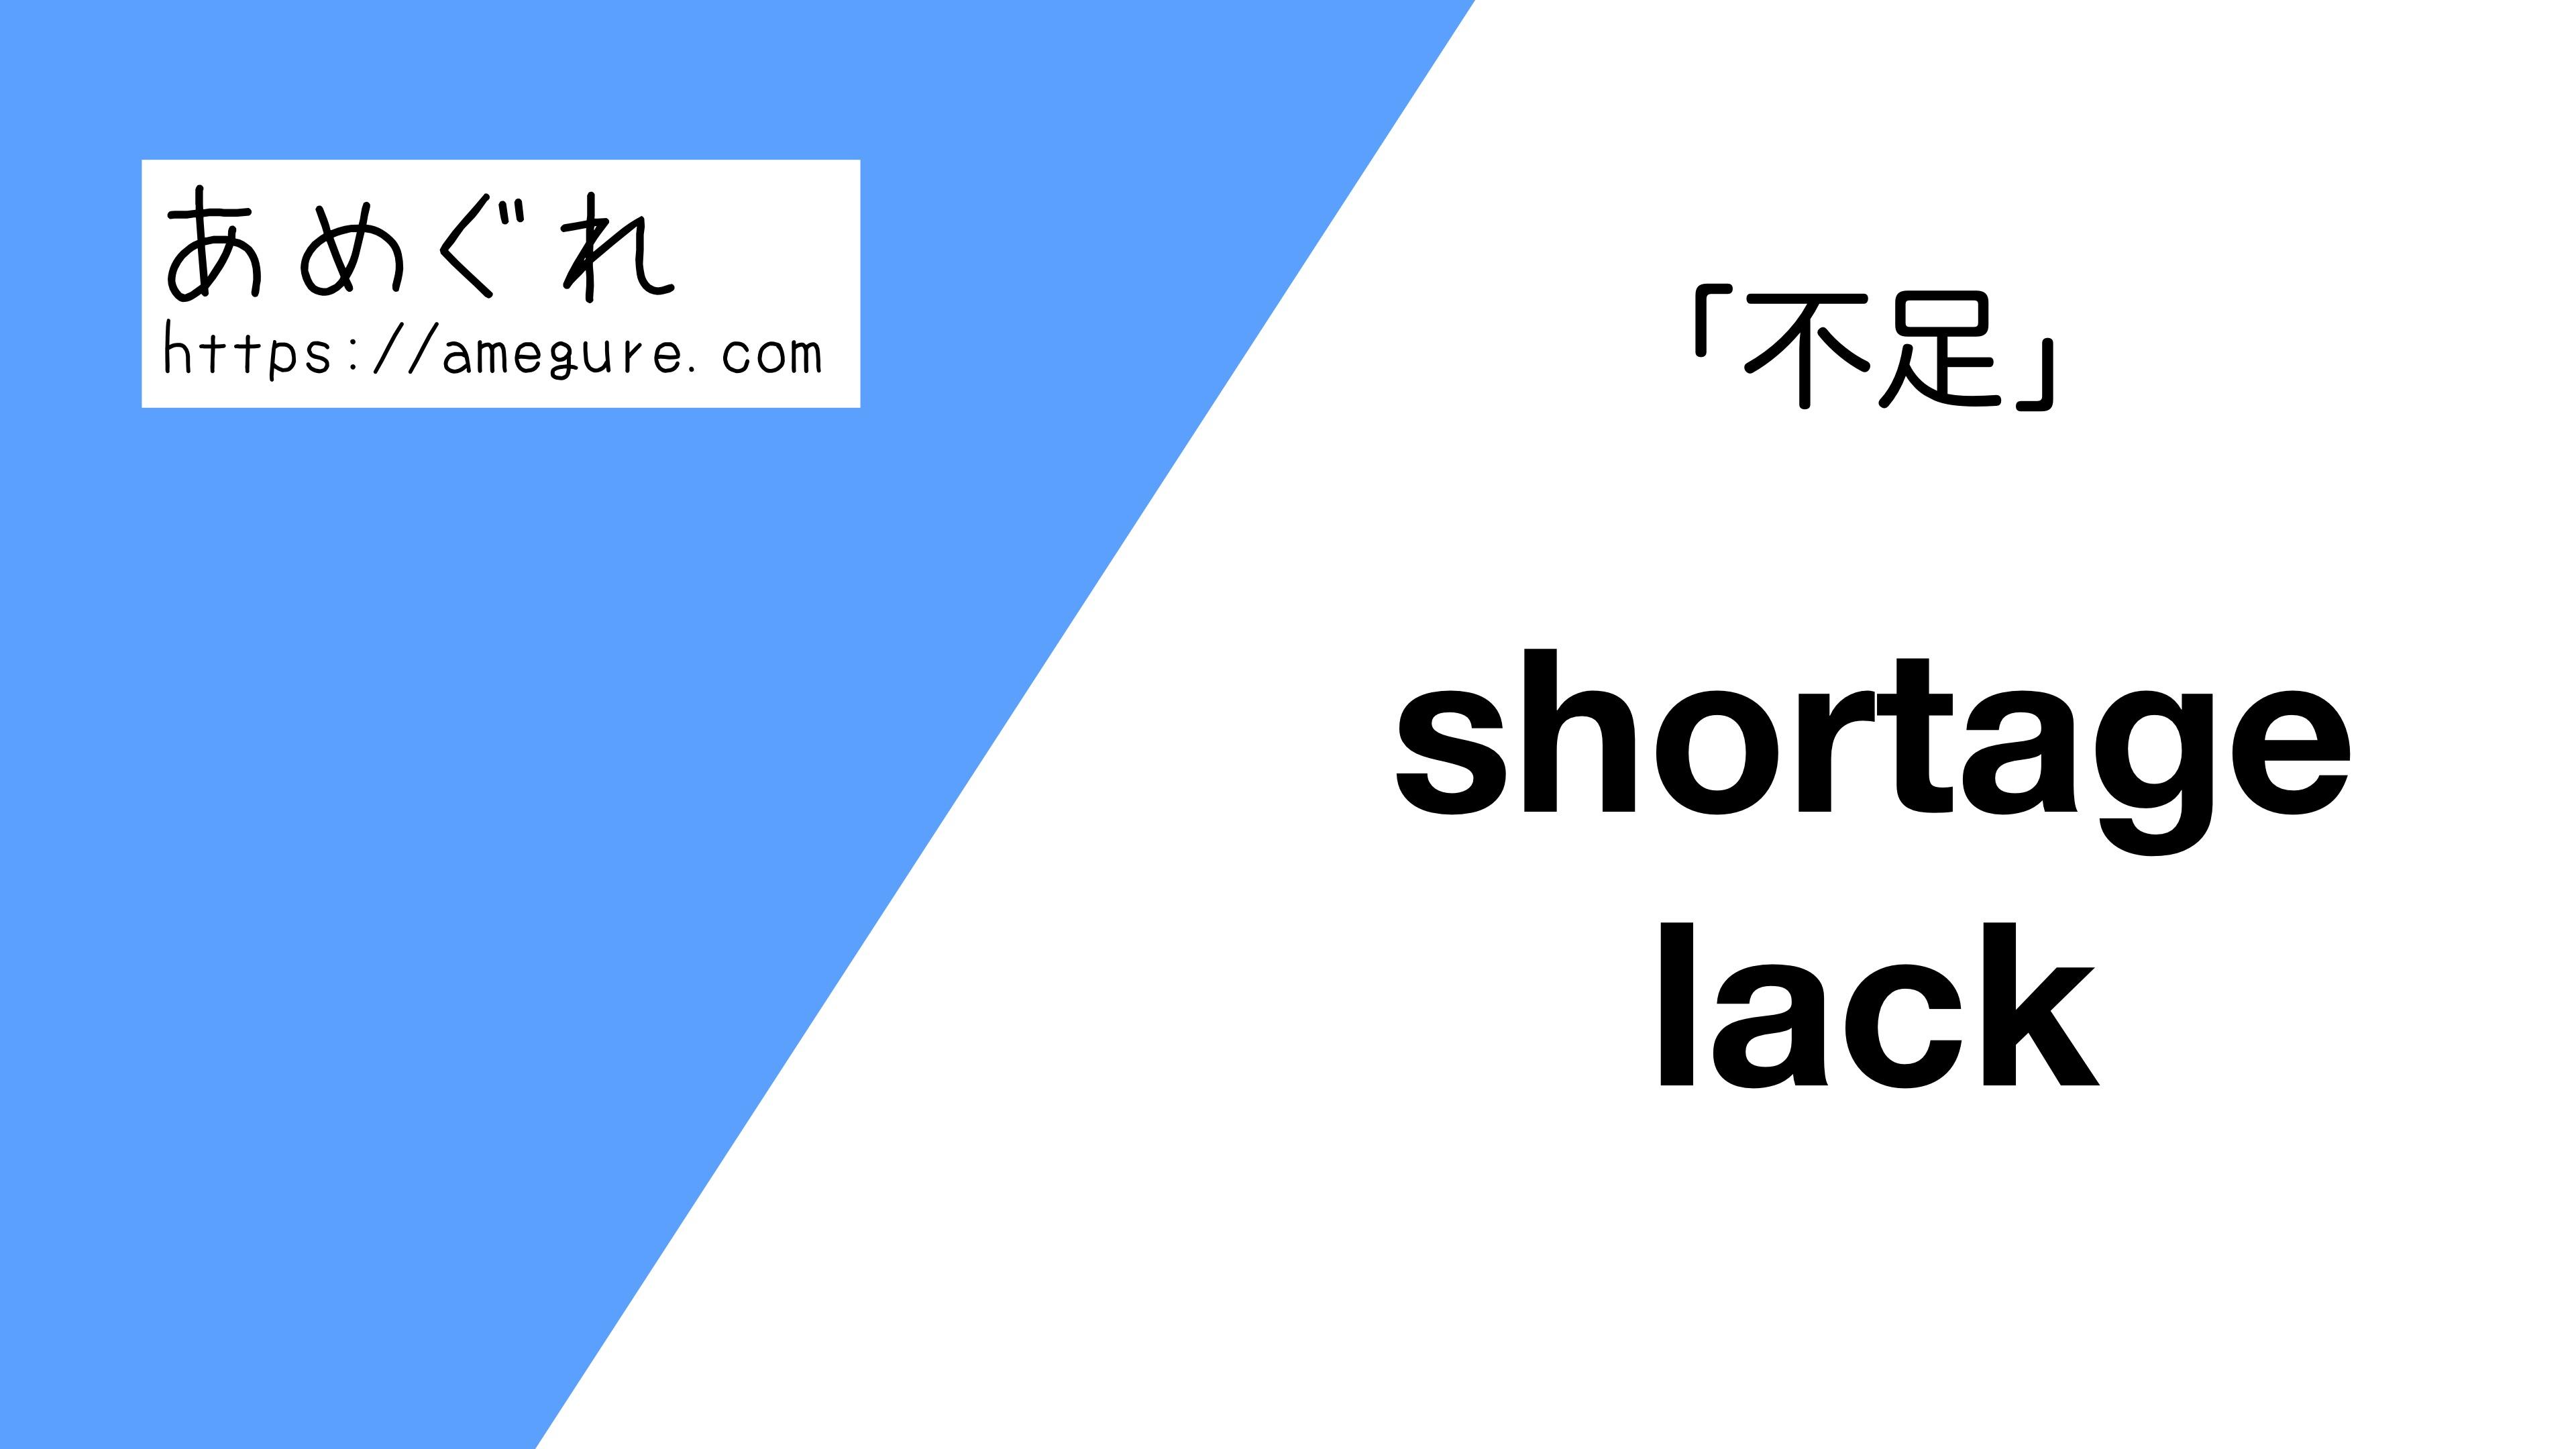 shortage-lack違い